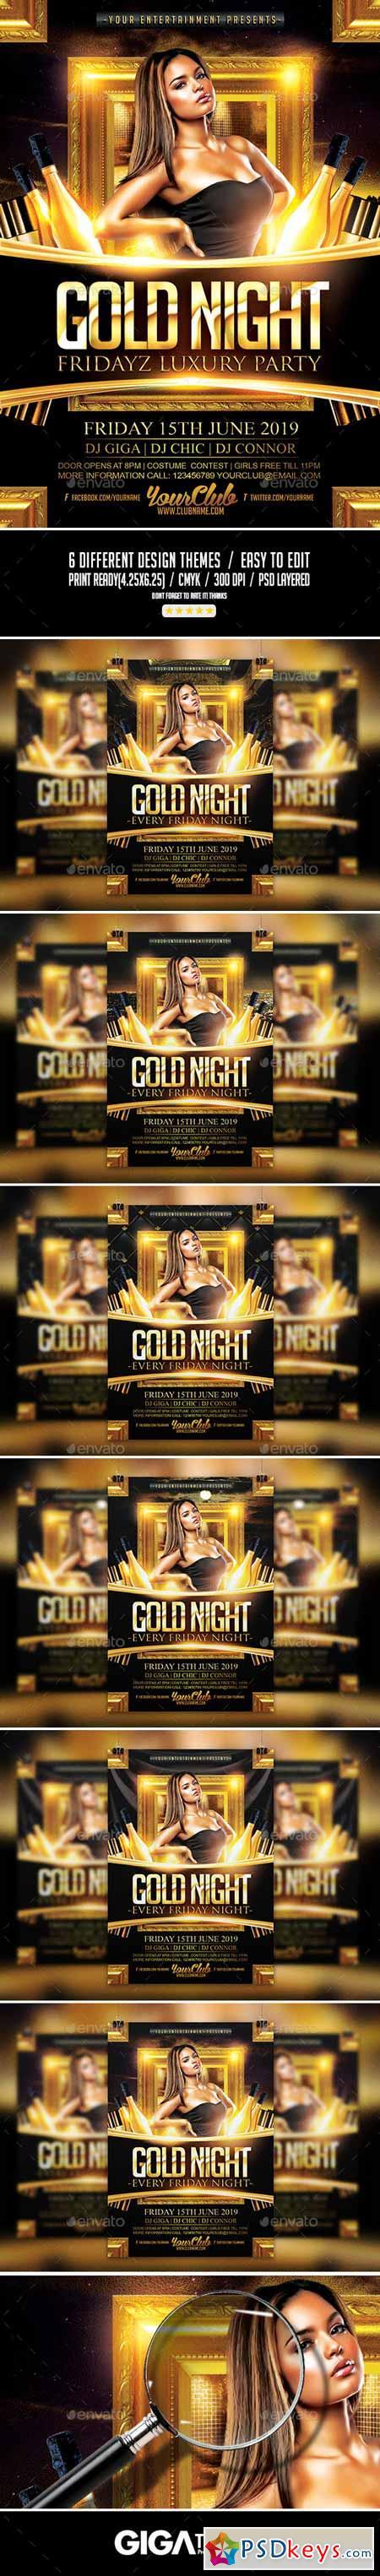 Gold Night Fridayz Luxury Flyer PSD Template 11265160